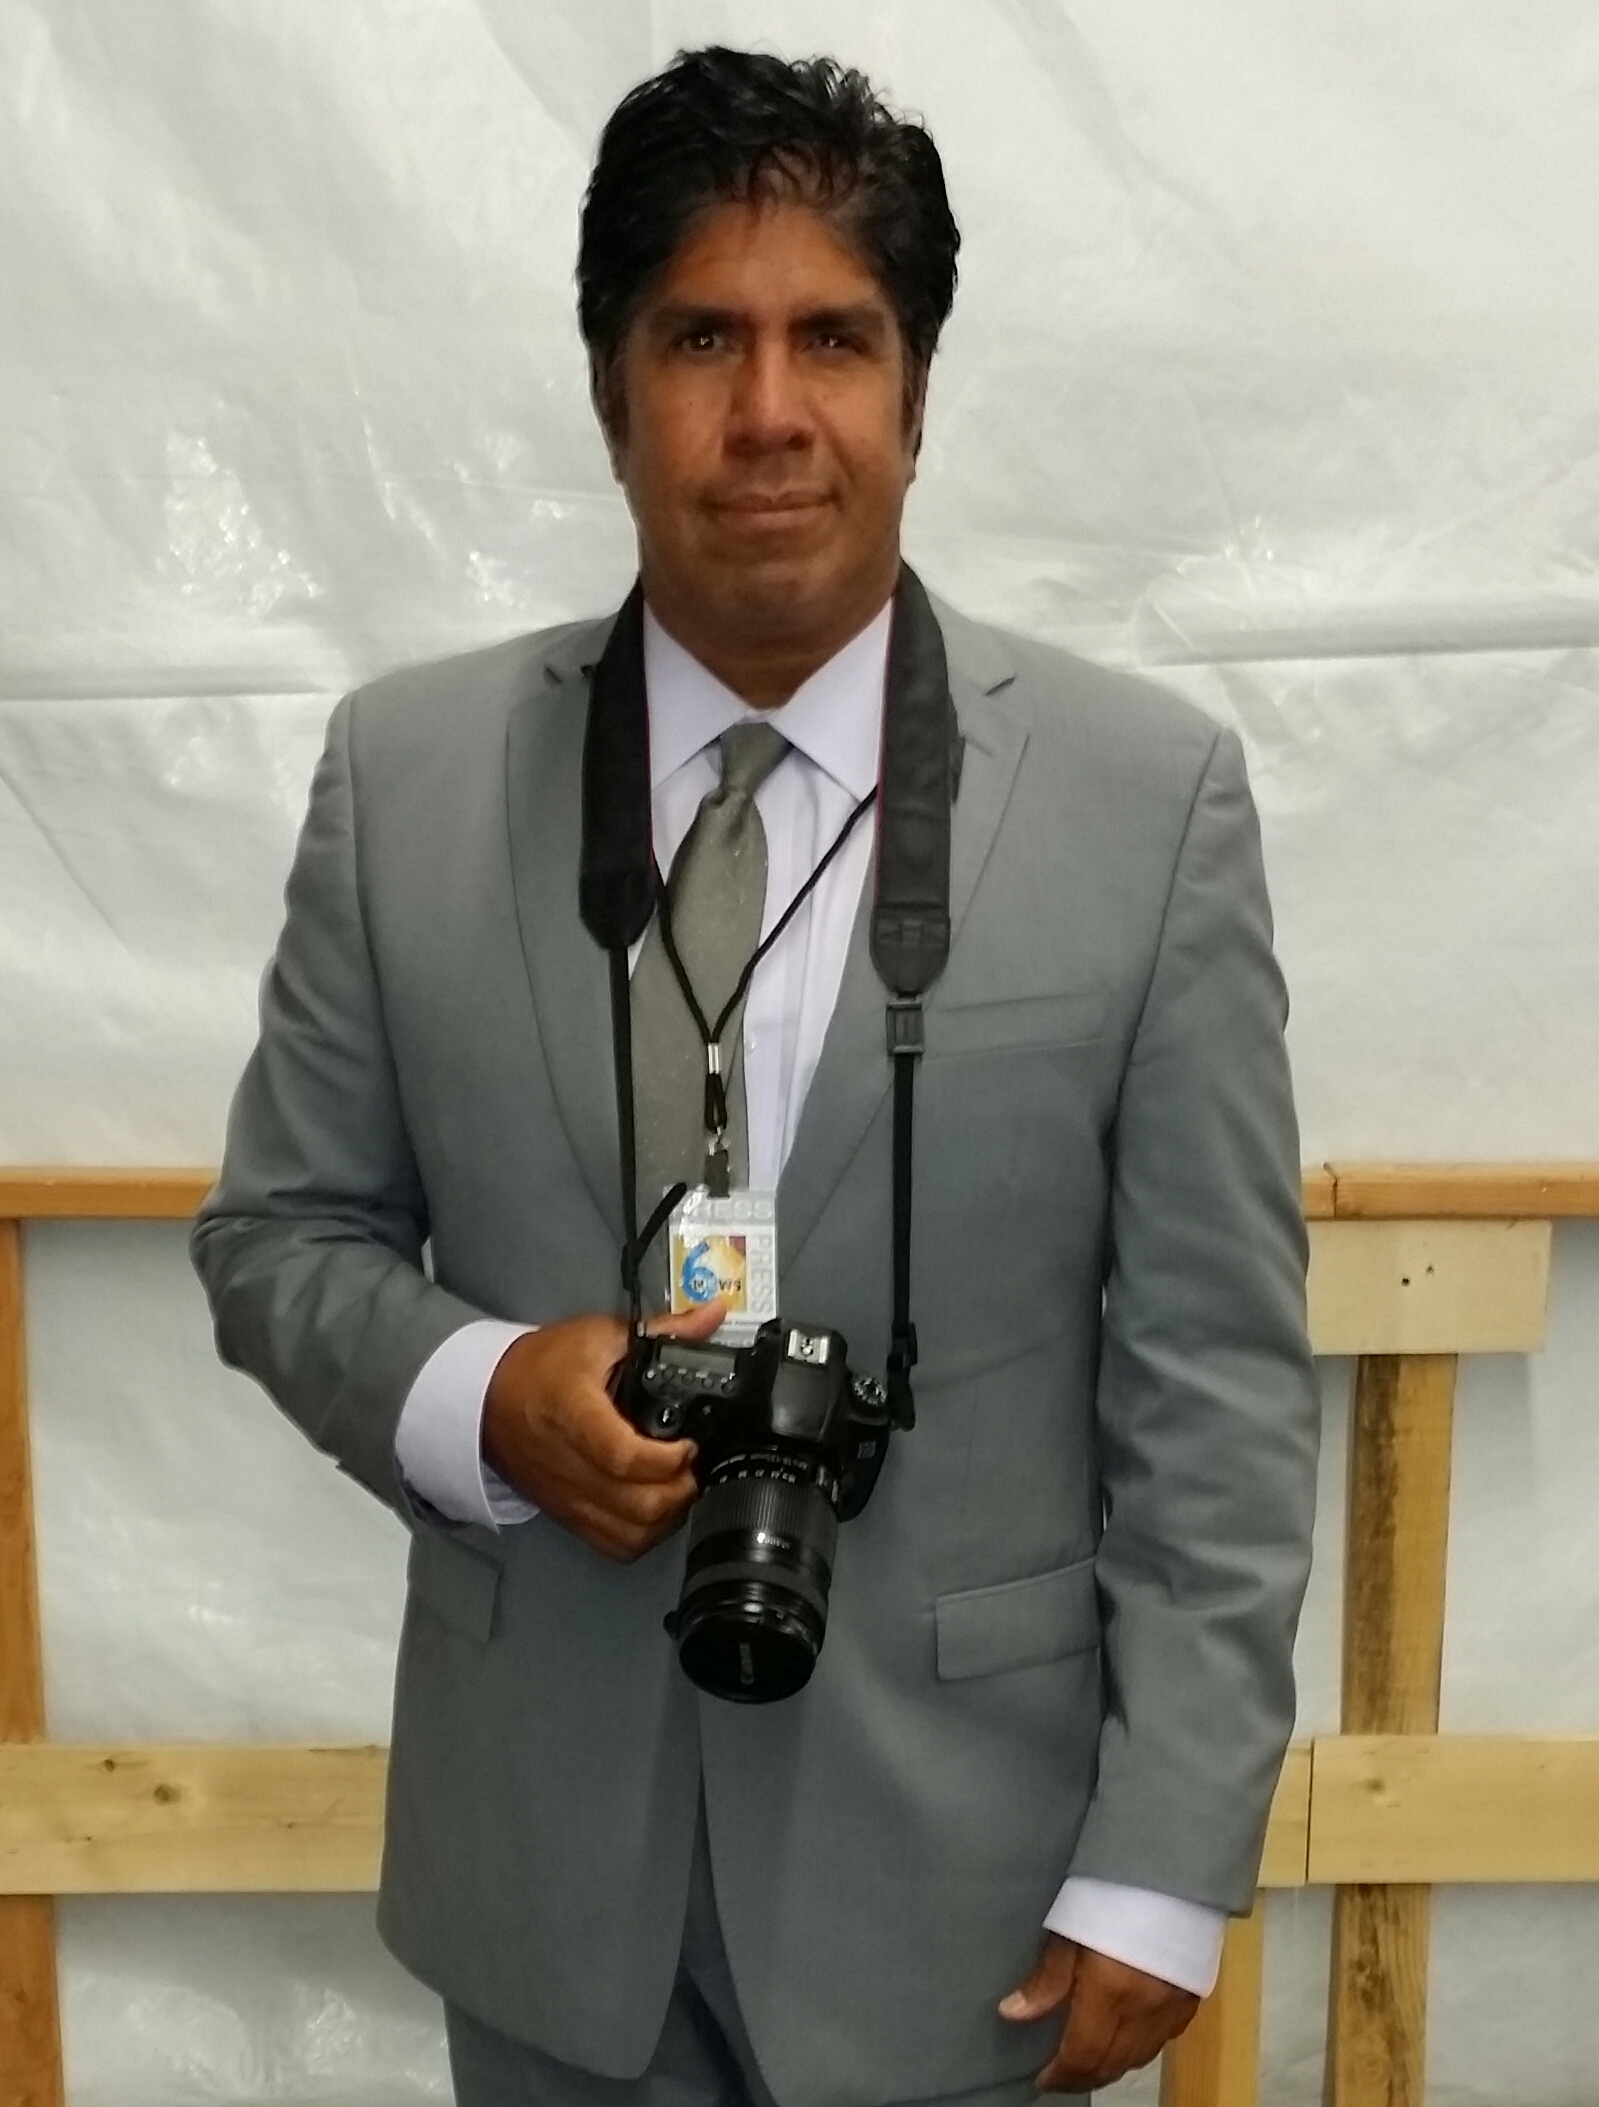 White House Press Photographer - KEY & PEELE sketch / Comedy Central